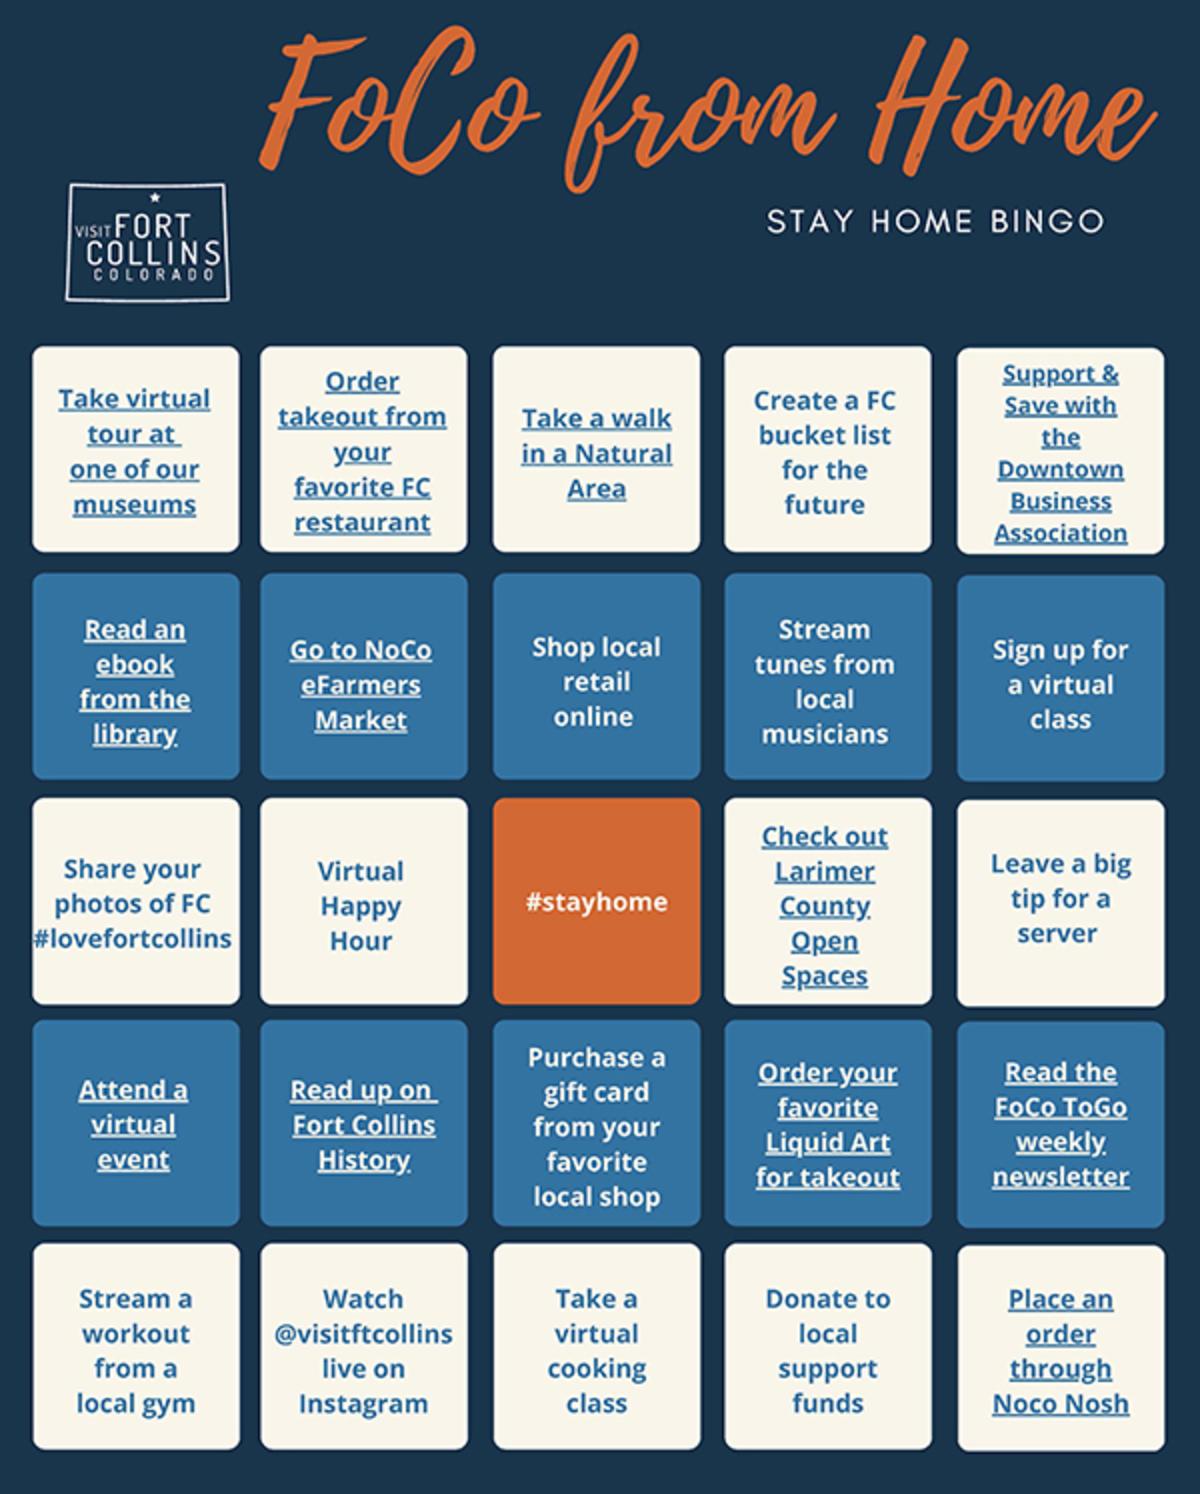 FoCo from Home Bingo